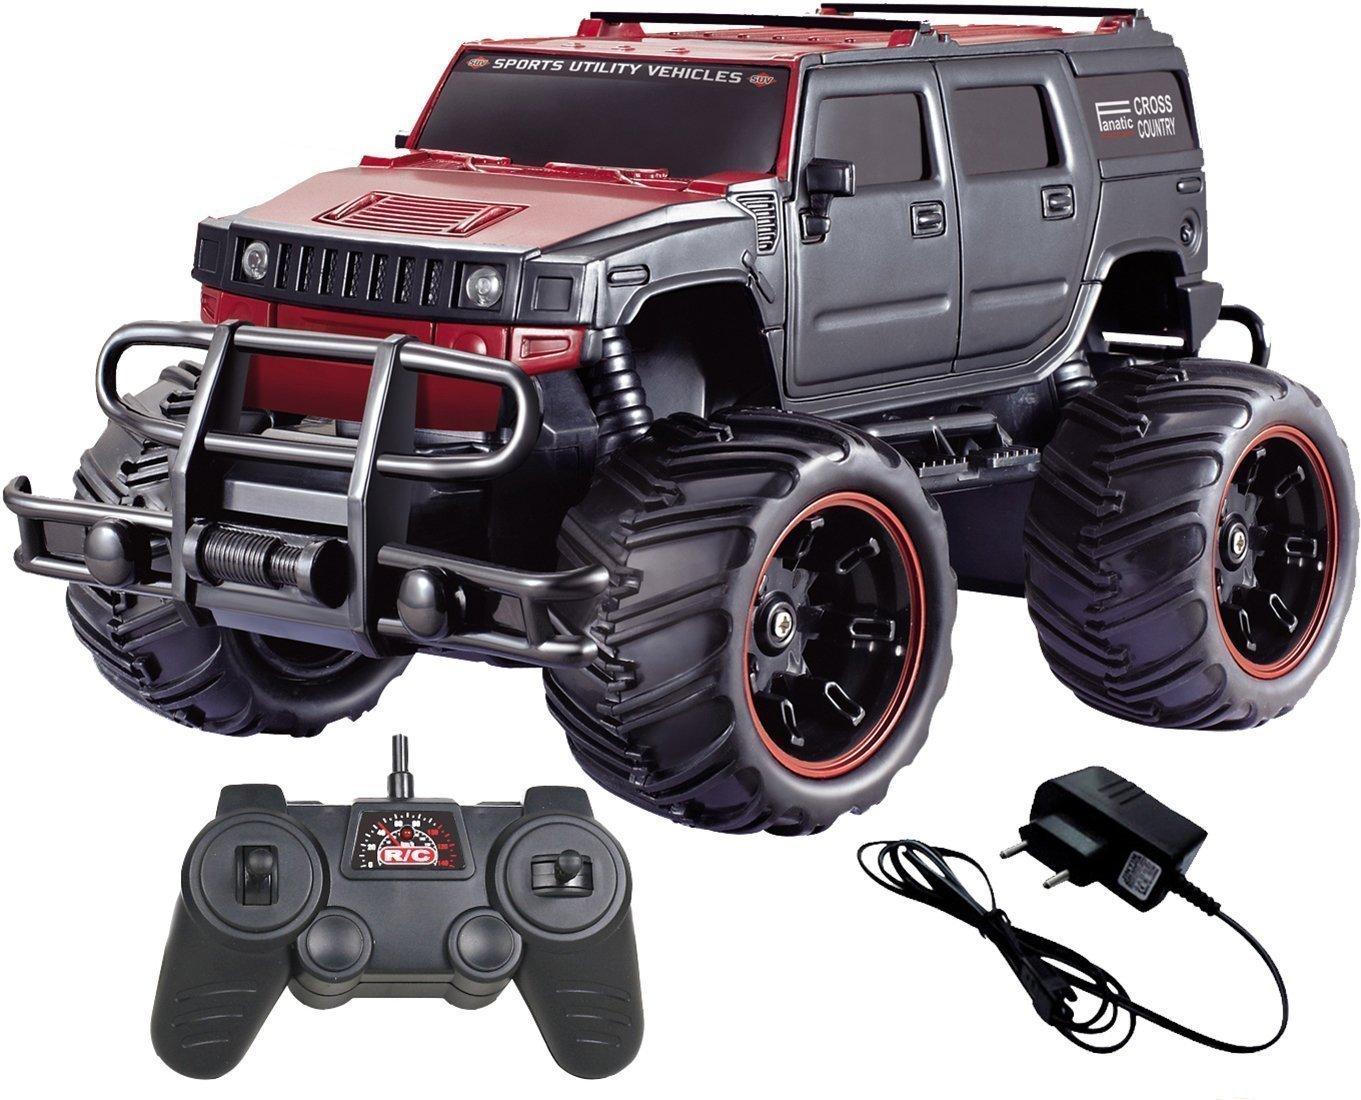 Zest 133 Toyz Remote Control Big Hummer Style Truck 13:13 (Red Black Xc13) | truck hummer